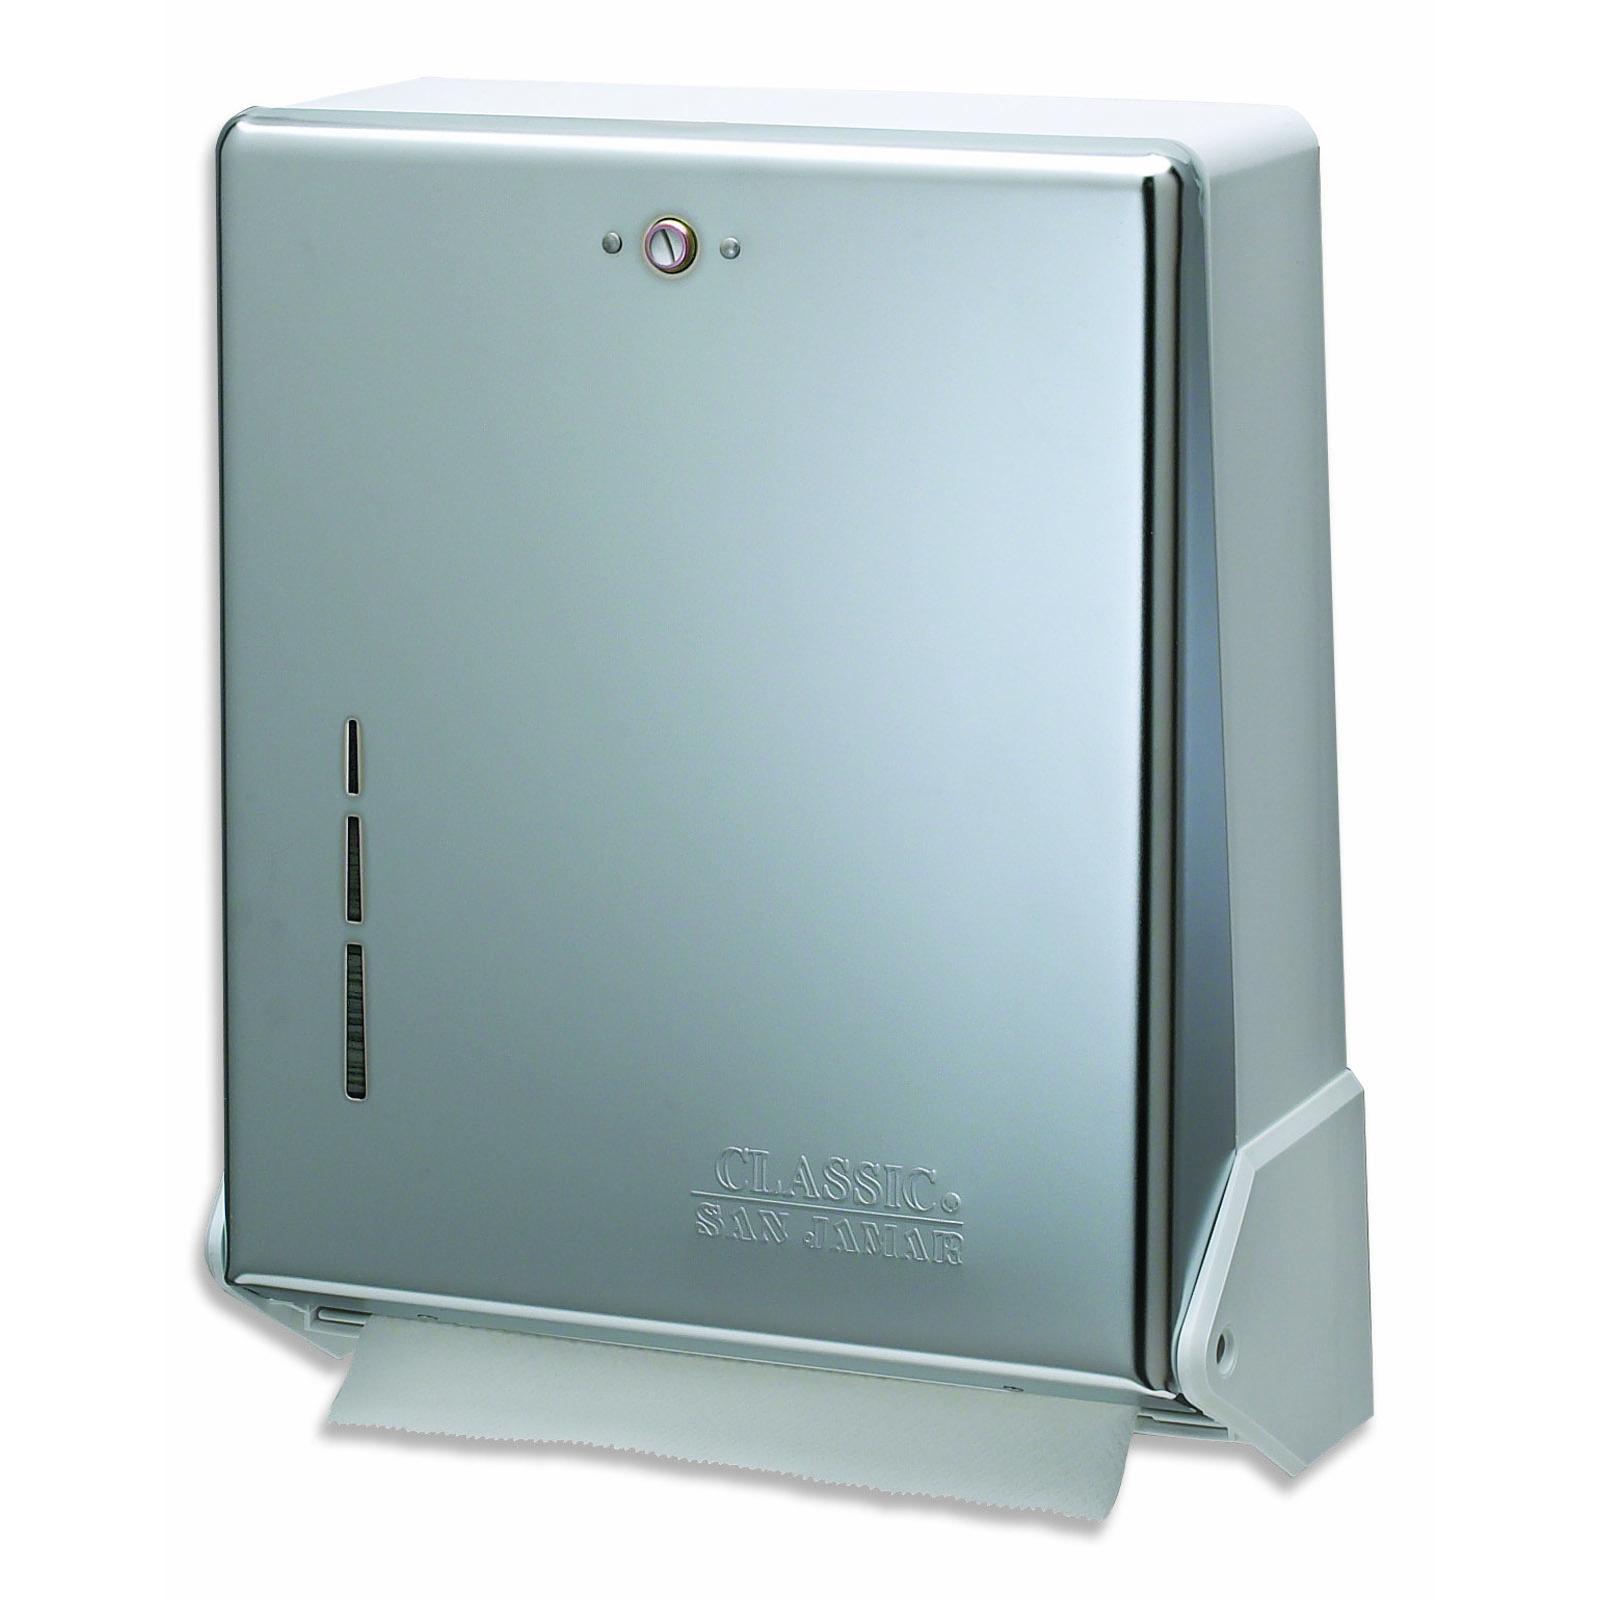 San Jamar T1905XC paper towel dispenser